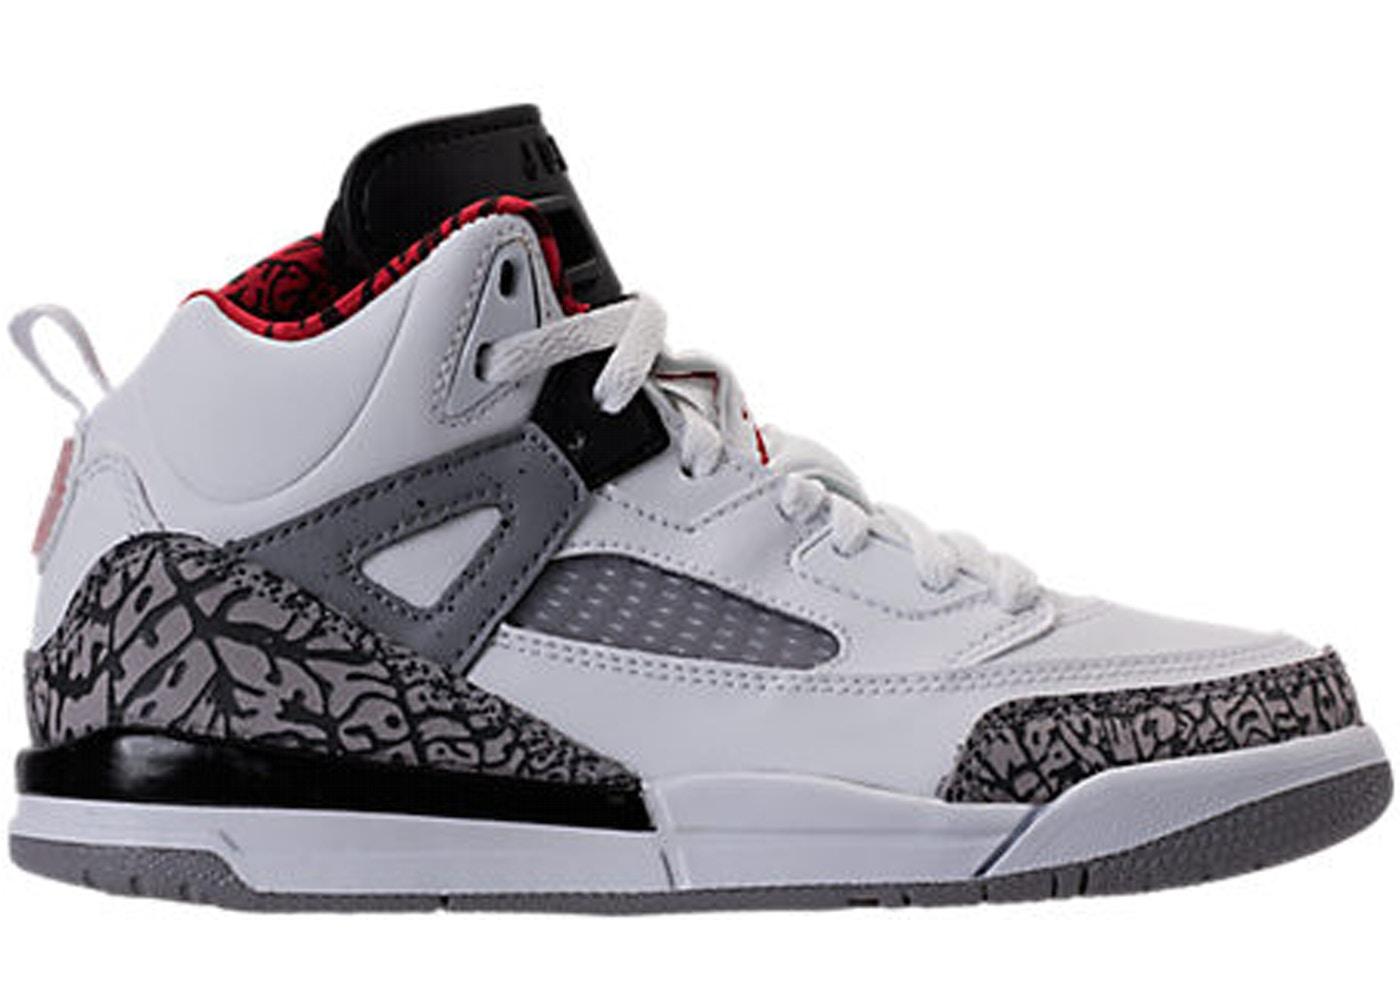 online store 18a55 73713 Jordan Spizike White Cement 2017 (PS)